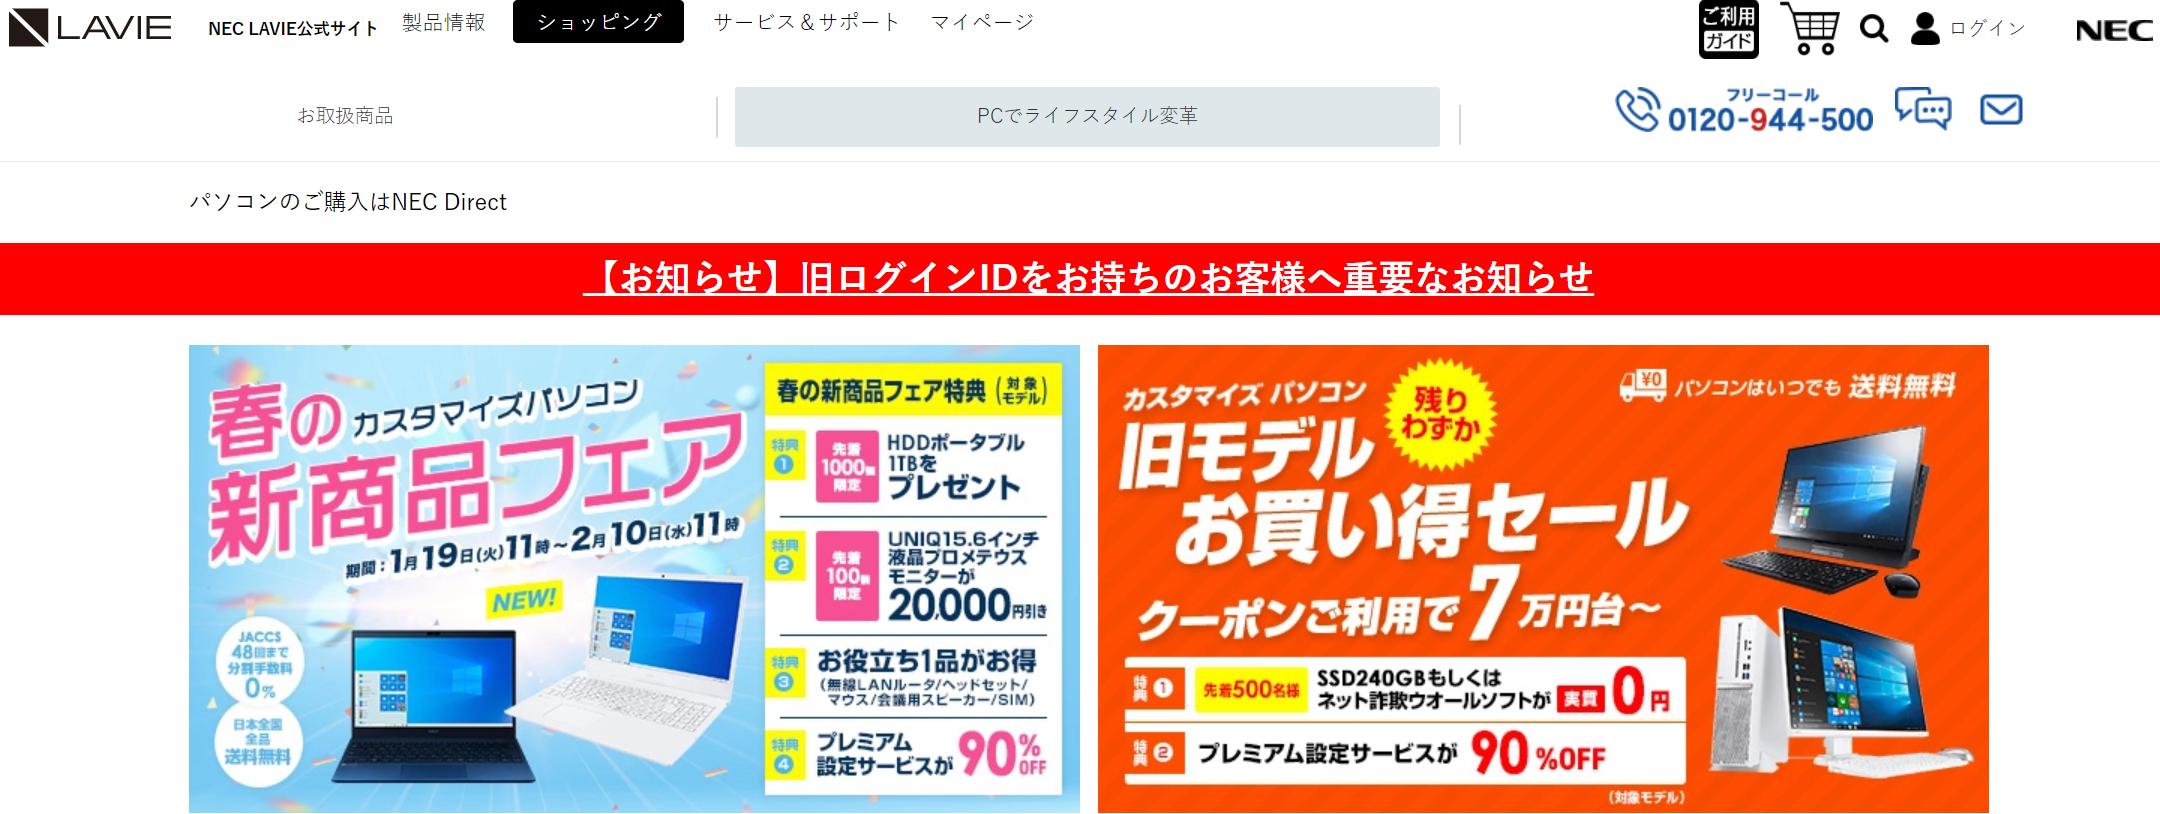 NEC_LAVIEサイト画像